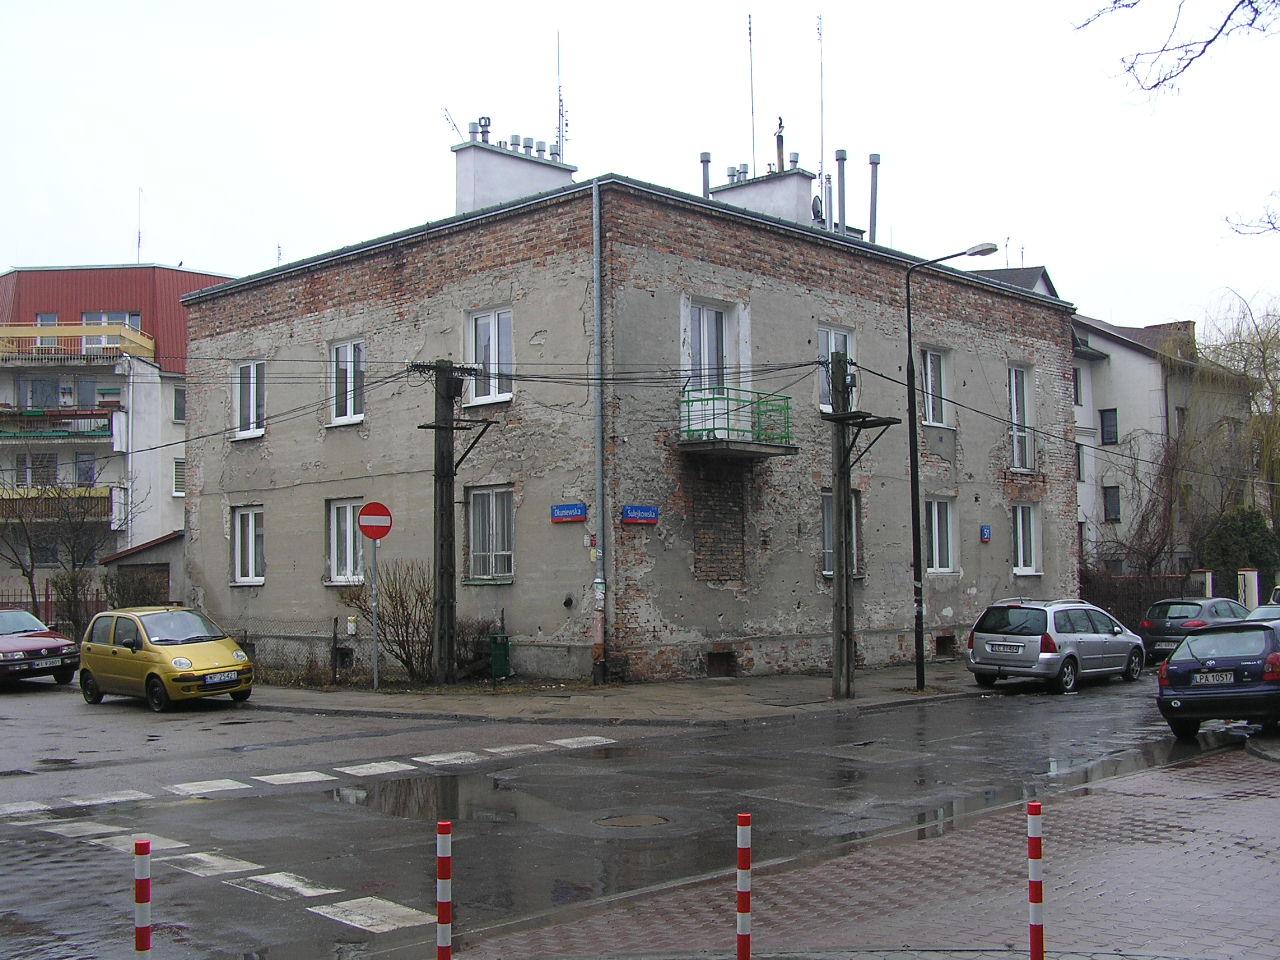 Sulejkowska 51